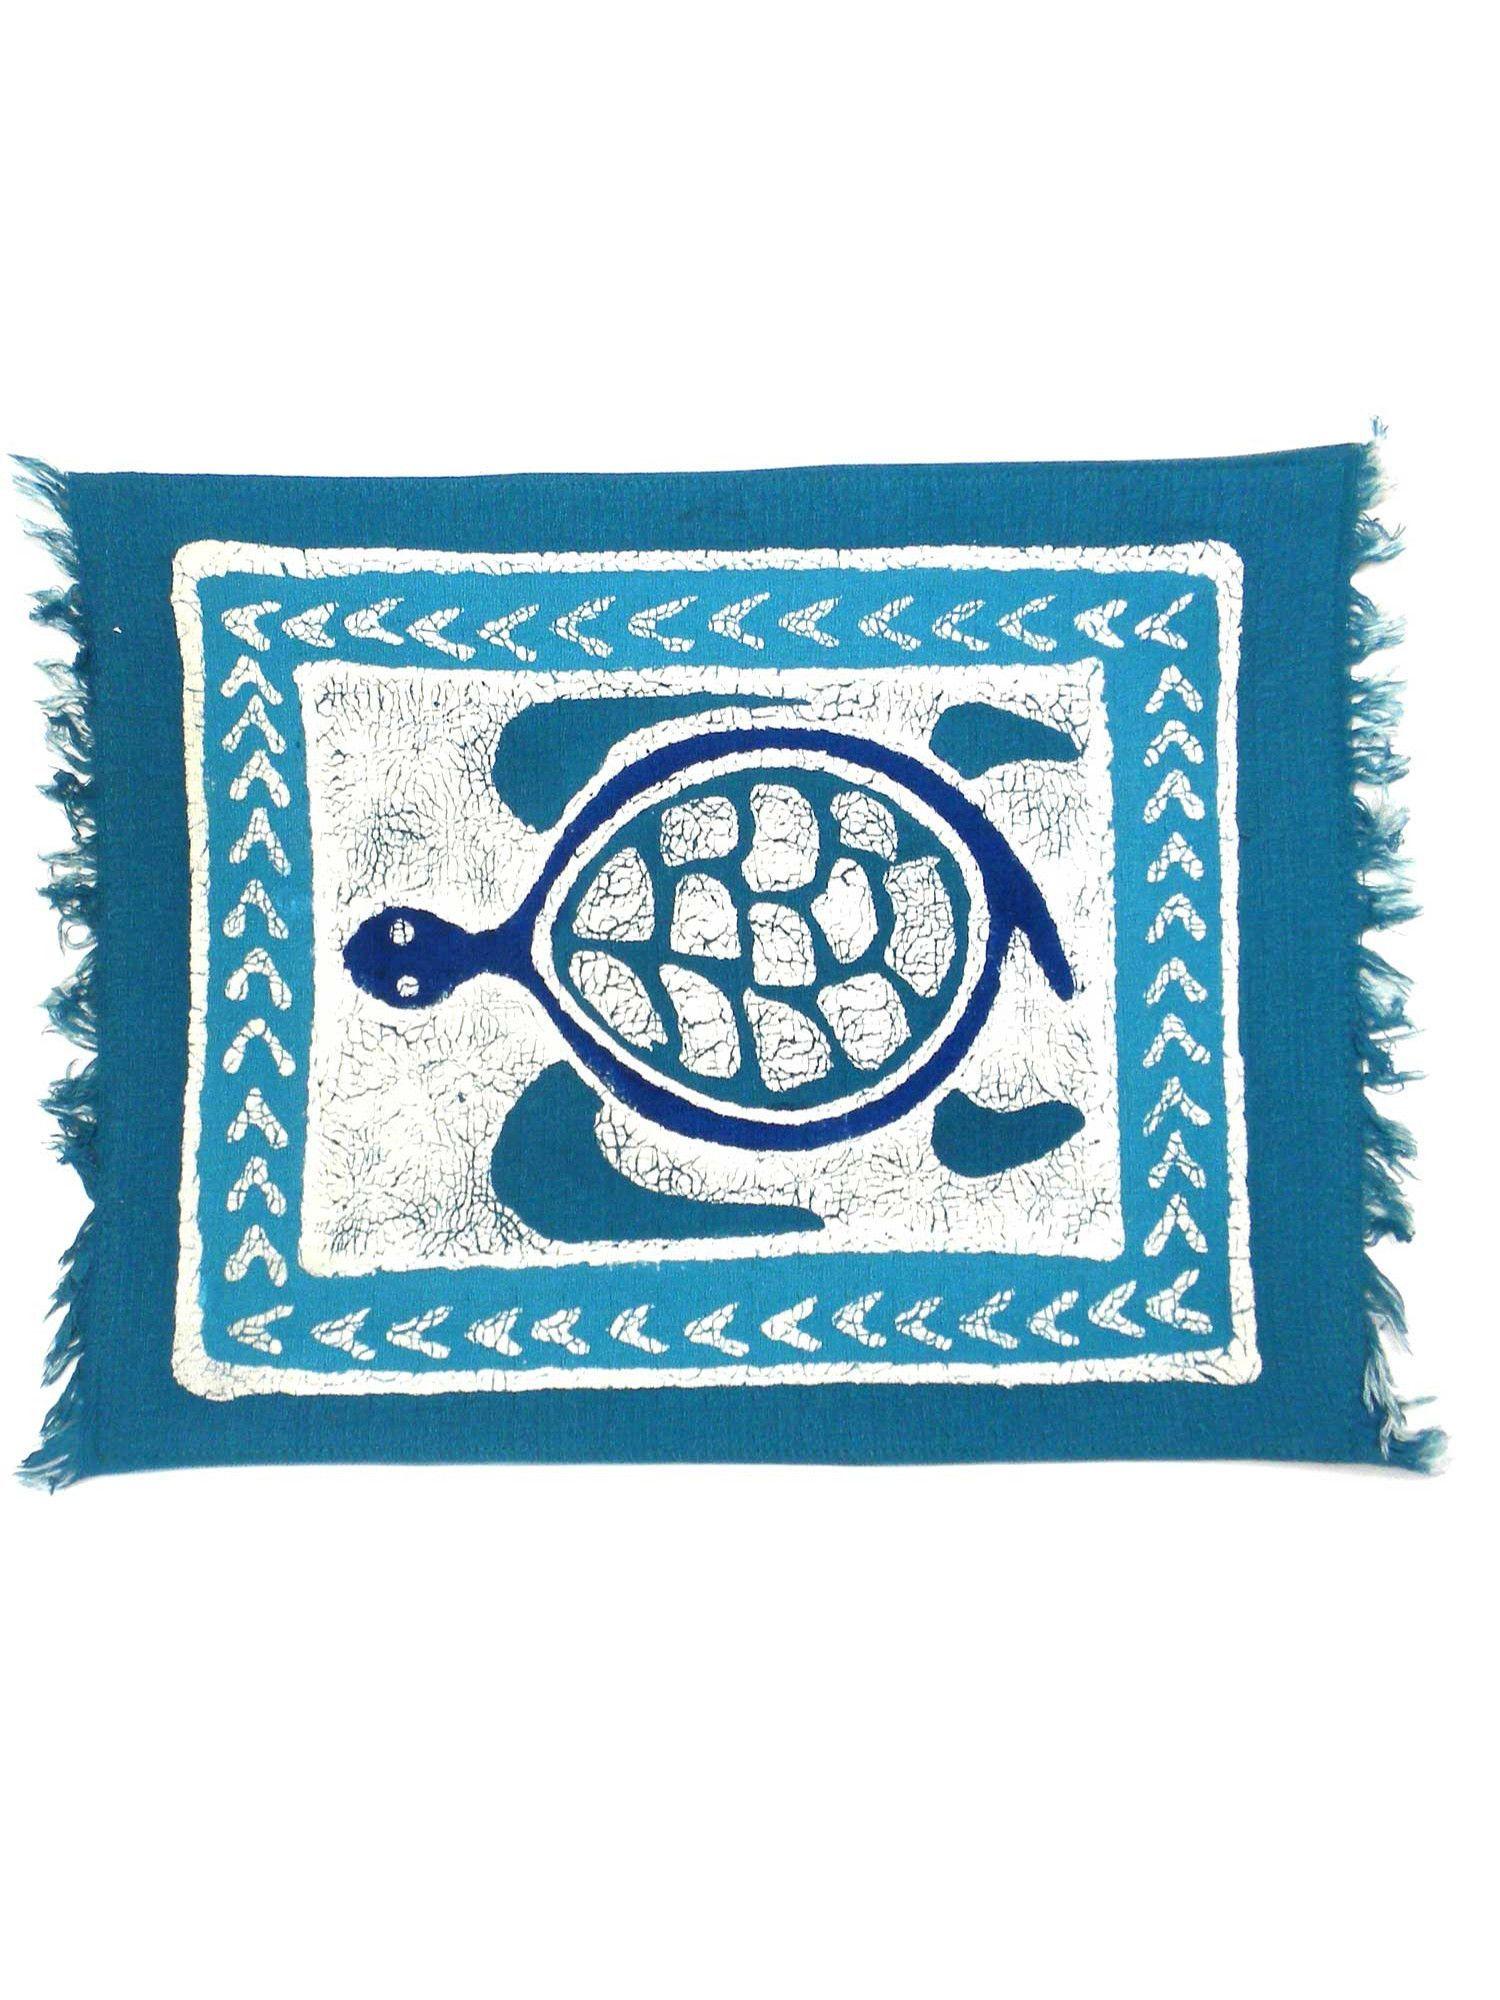 Handpainted Blue Turtle Batiked Placemat   Gift ideas   Pinterest ...